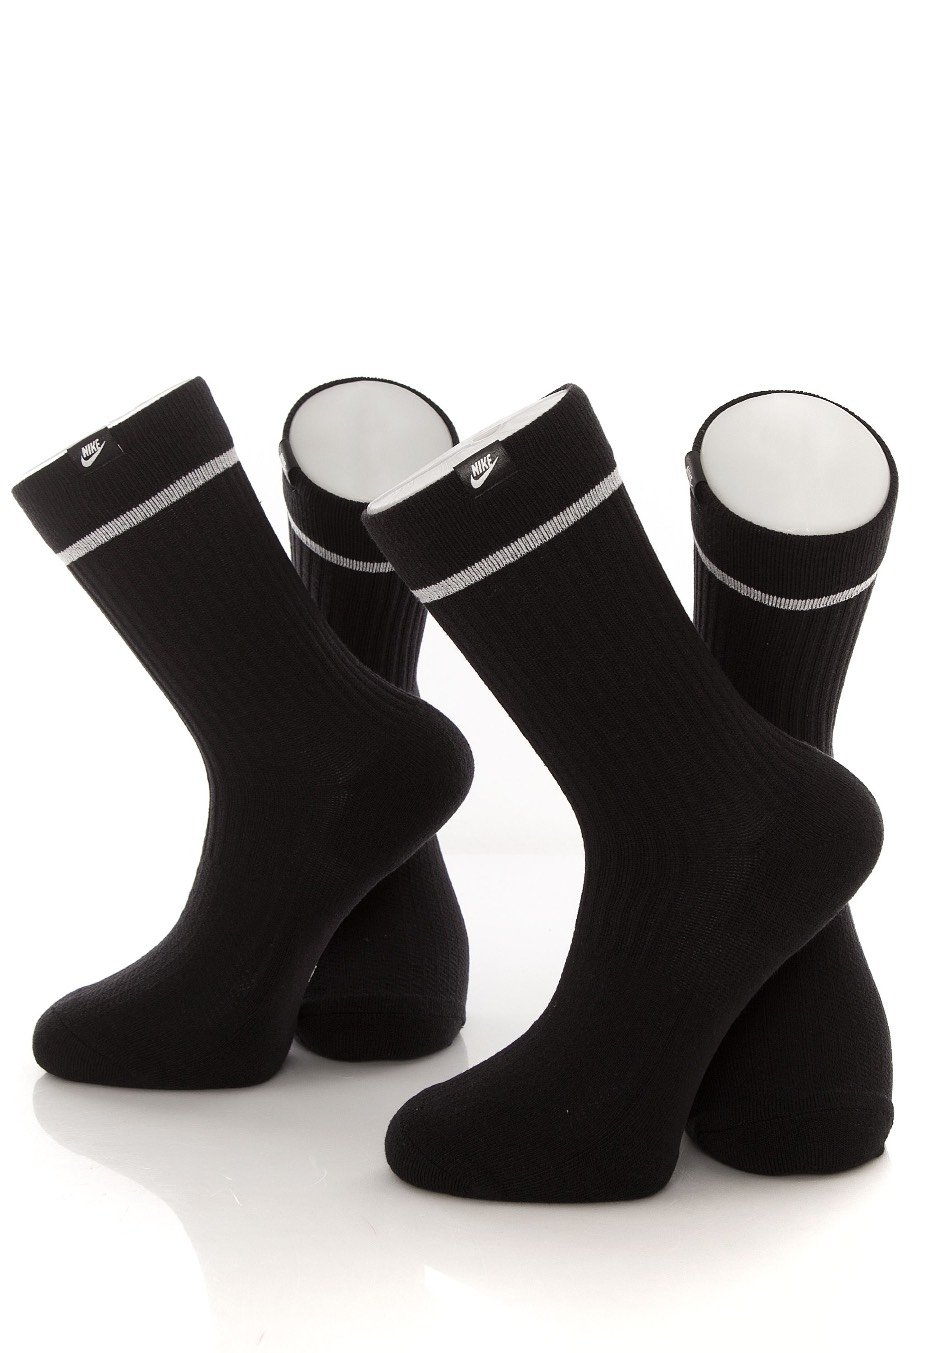 25b4e774c83 Nike - Essential Crew Black White White - Socks - Streetwear Shop ...